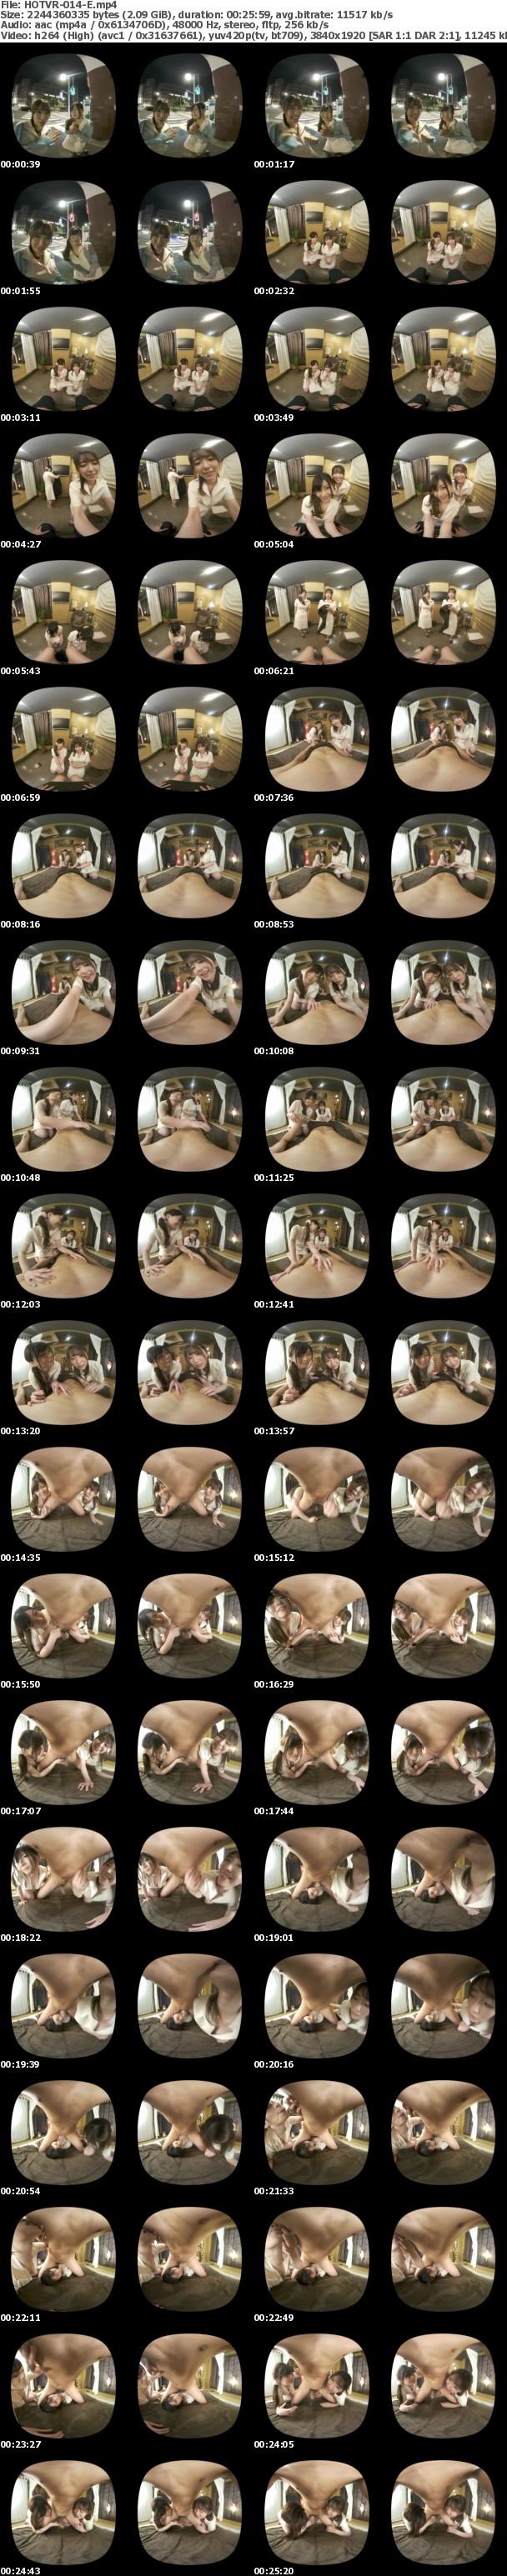 (VR) HOTVR-014 闇営業の回春中出しエステ「お店には内緒ですよ…?」美人エステティシャンの卑猥なお誘いに戸惑いながらも全身舐め上げられてフル勃起!ズブリと生挿入されて我慢できずに濃厚中出し!!長尺180分スペシャルパッケージ!!